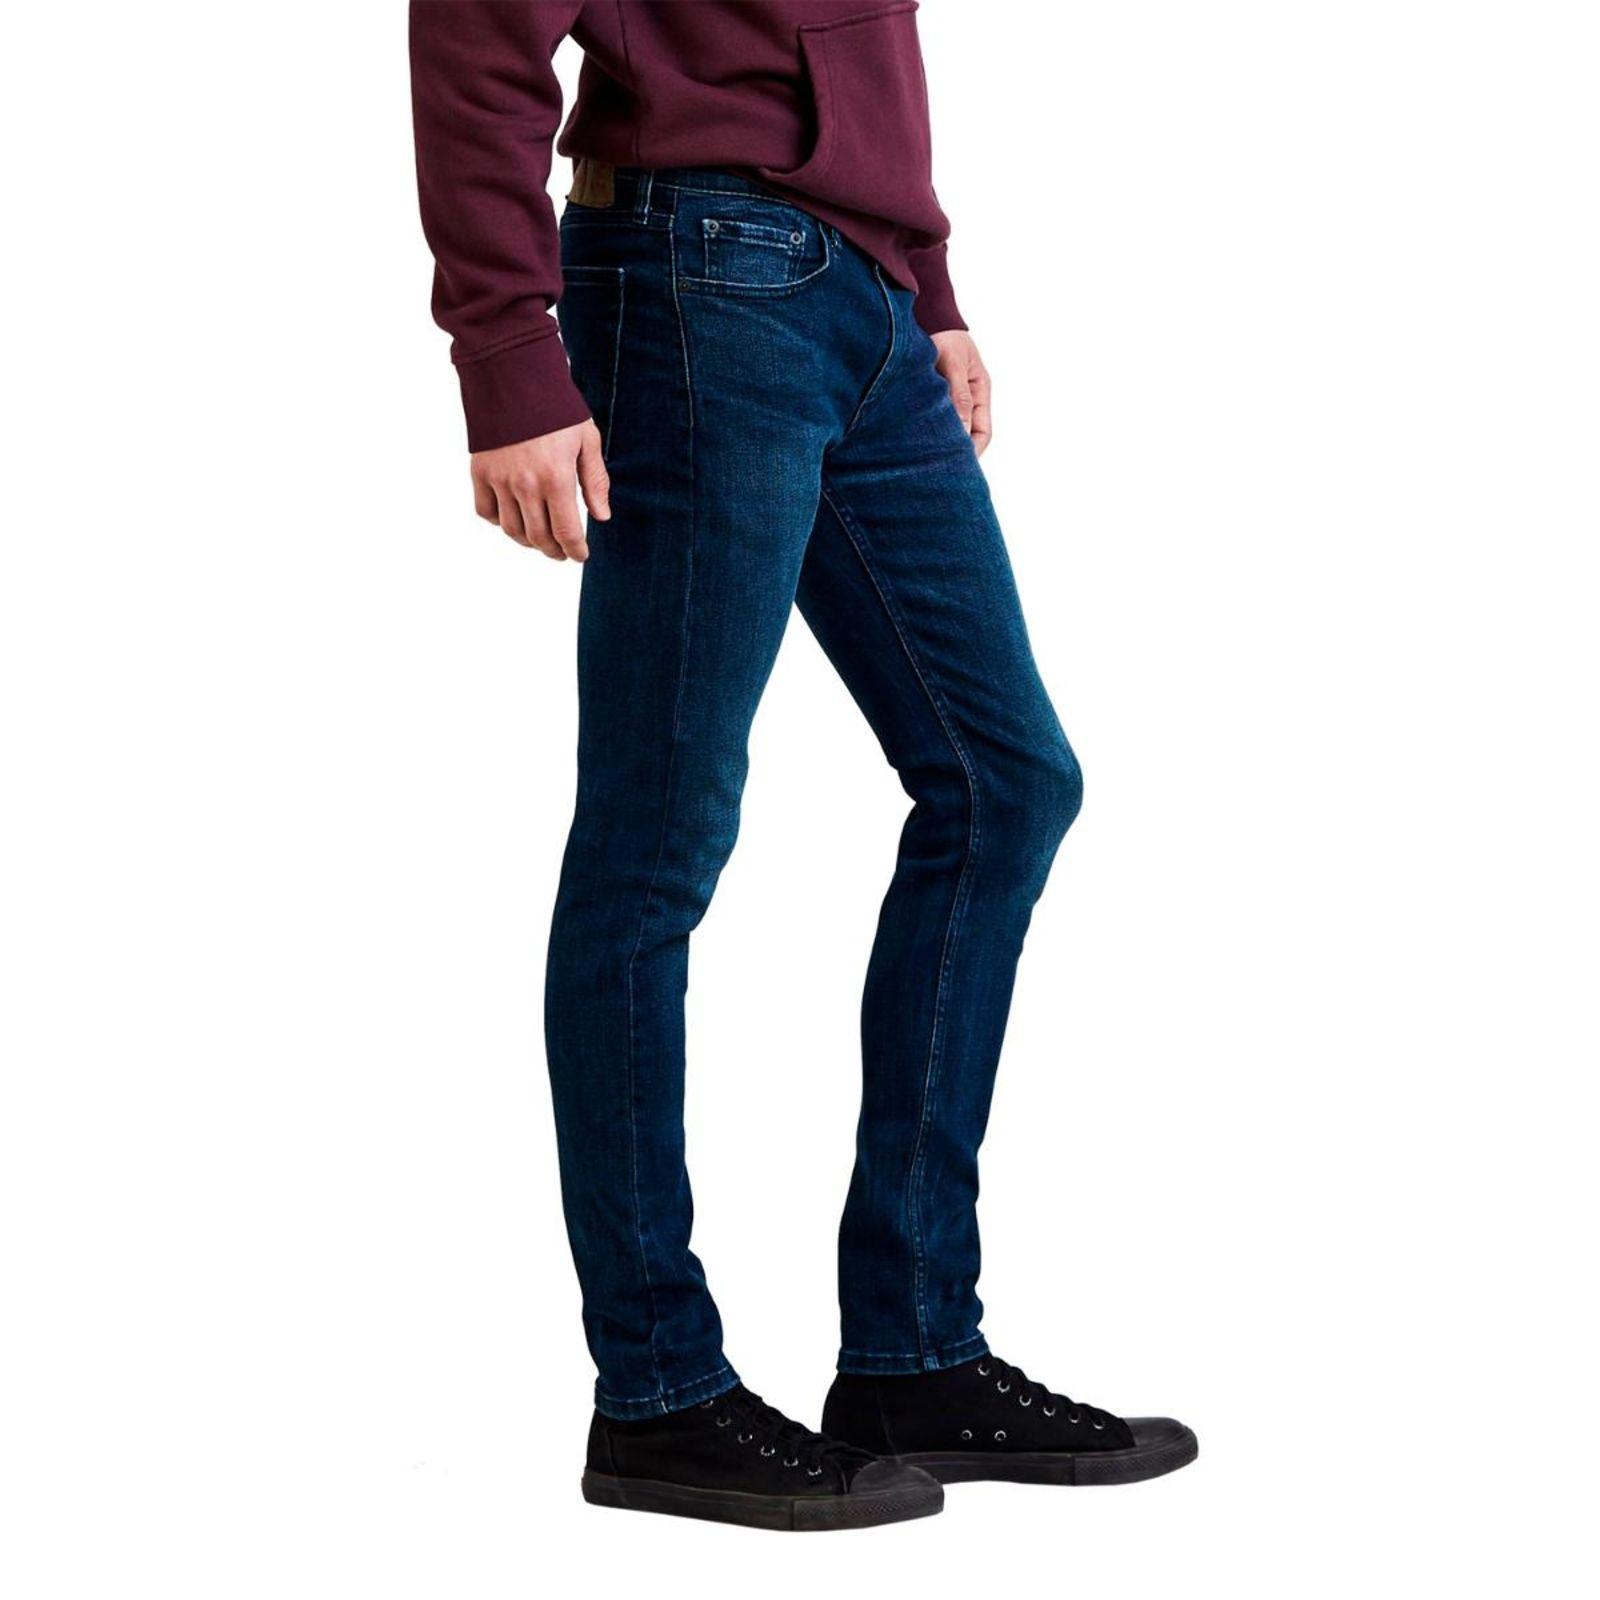 Calça Jeans Levis Masculina 519 Super Skinny no